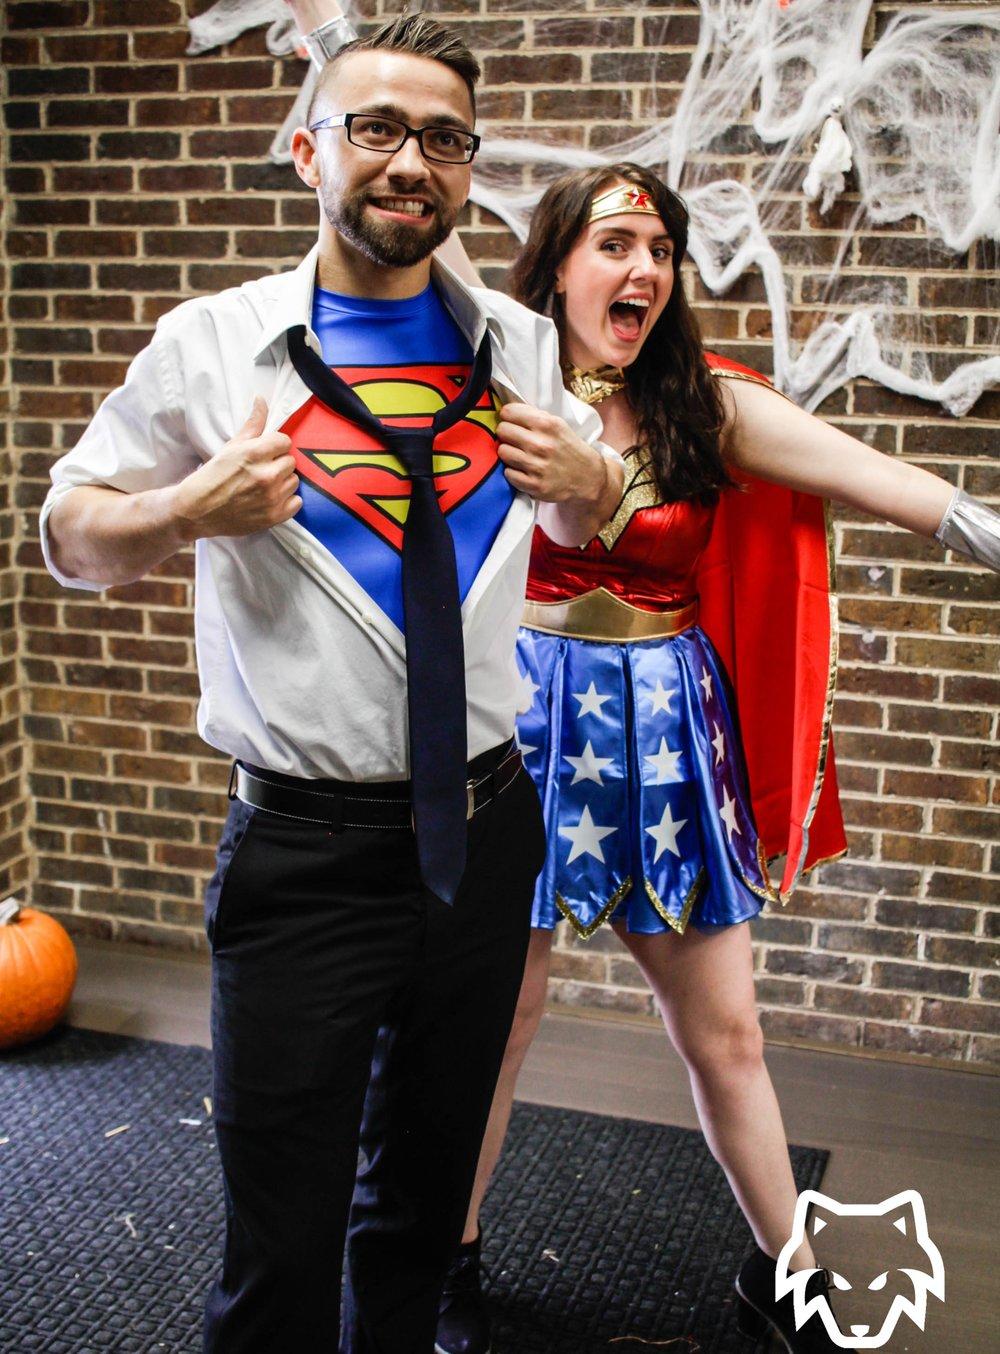 superman-wonderwoman-costume